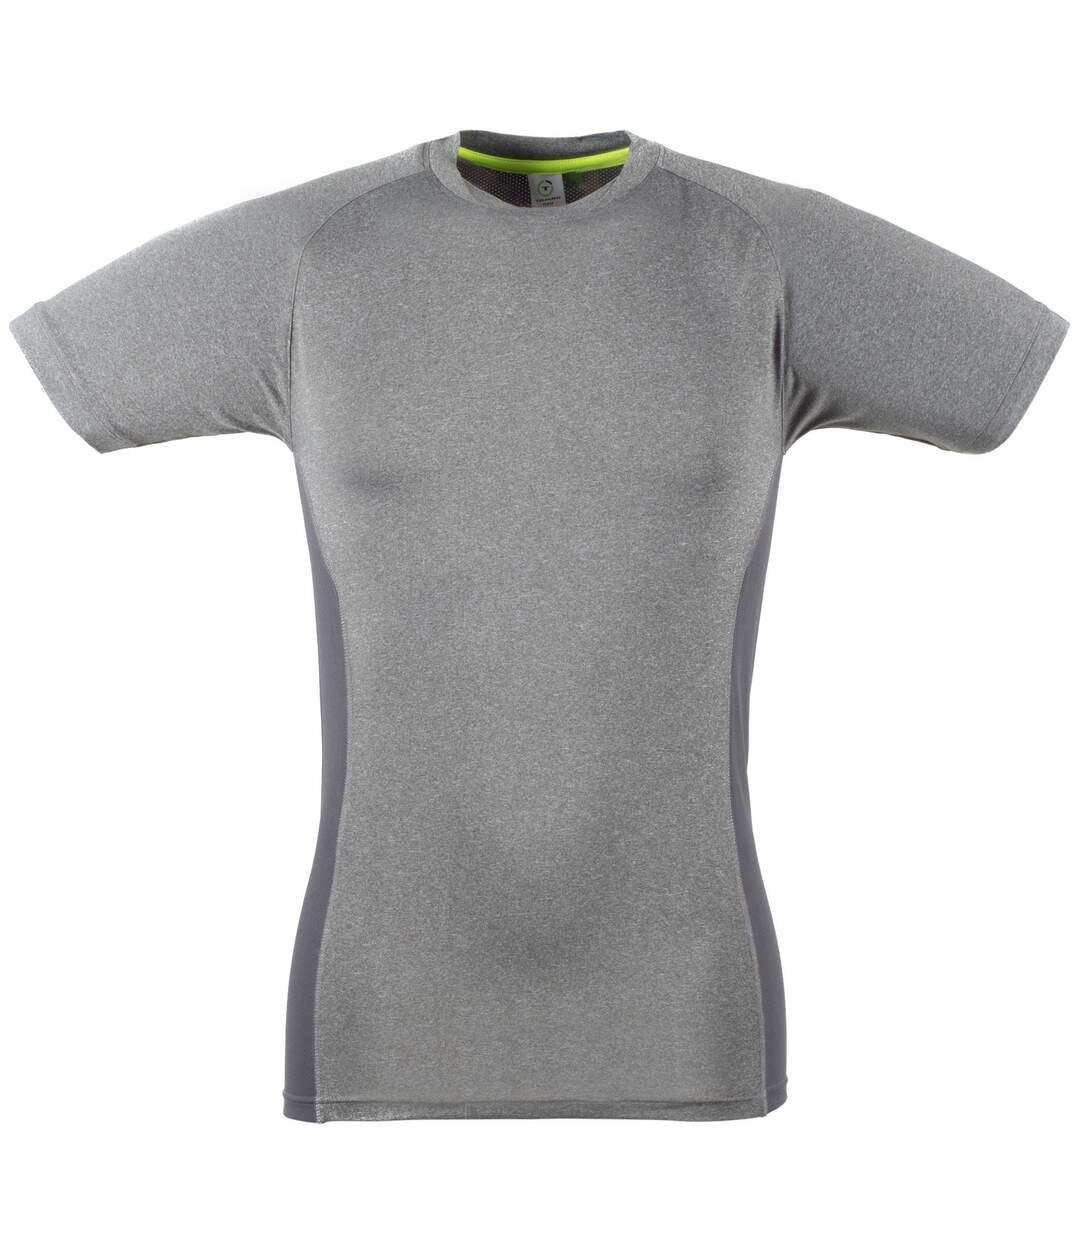 Tombo Teamsport Mens Slim Fit Short Sleeve T-Shirt (Grey Marl / Grey) - UTRW4788